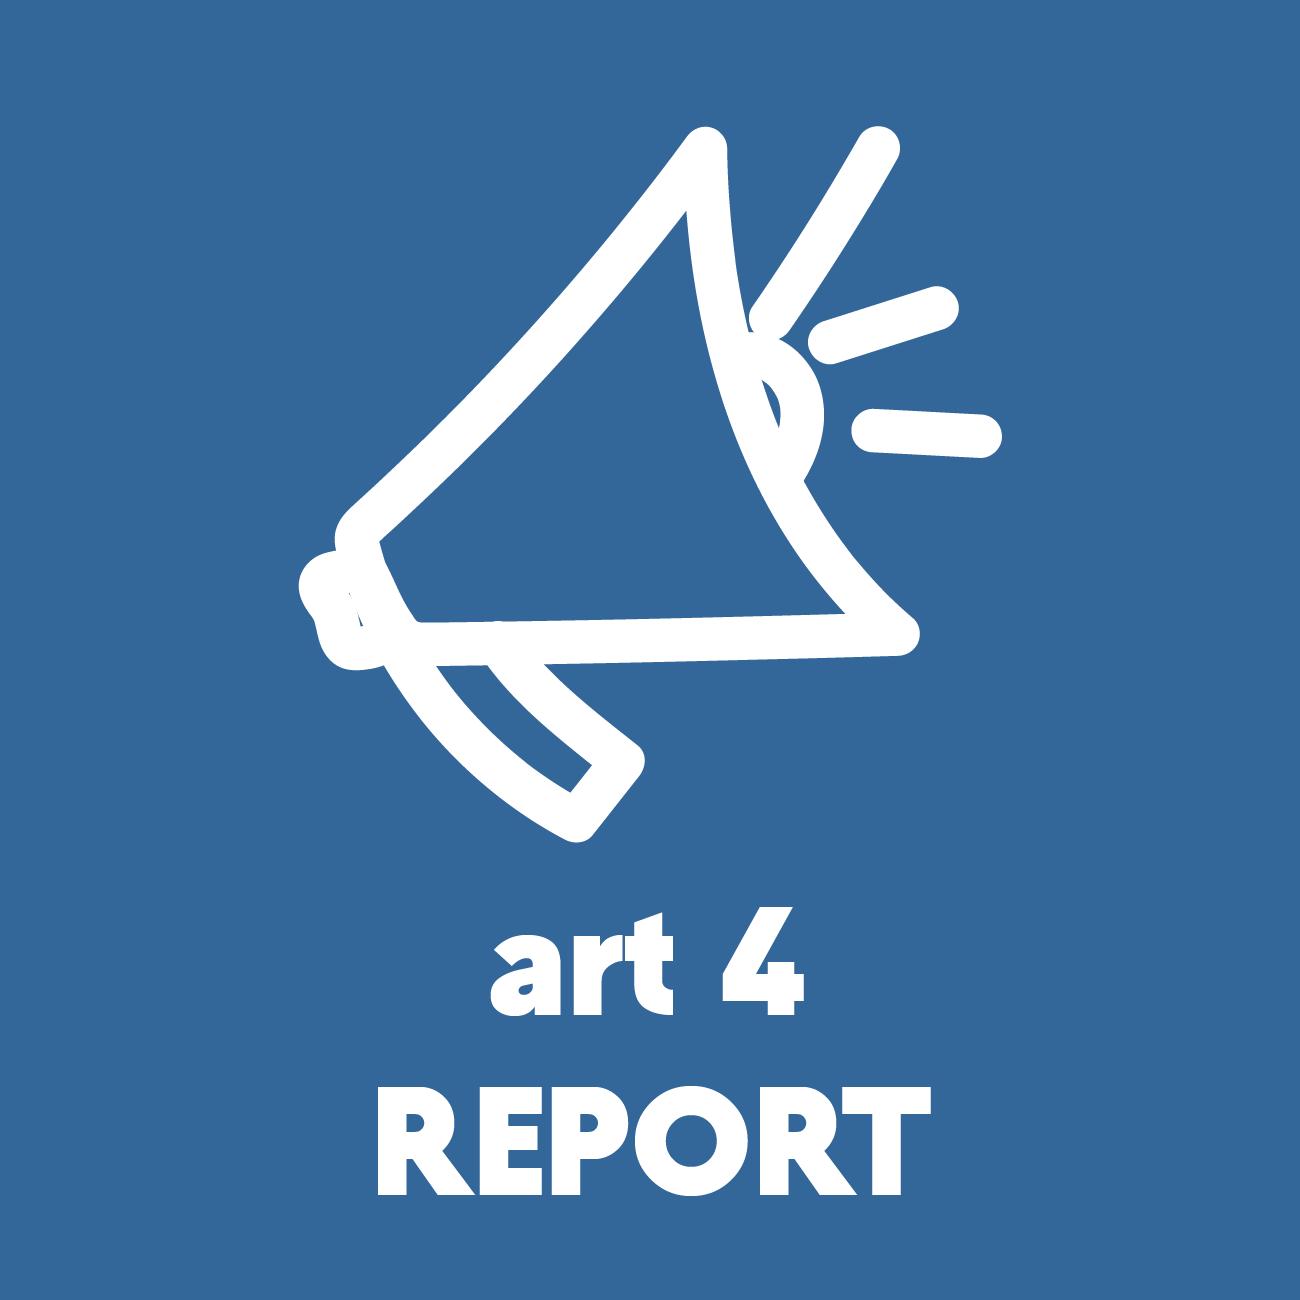 Art 04 report